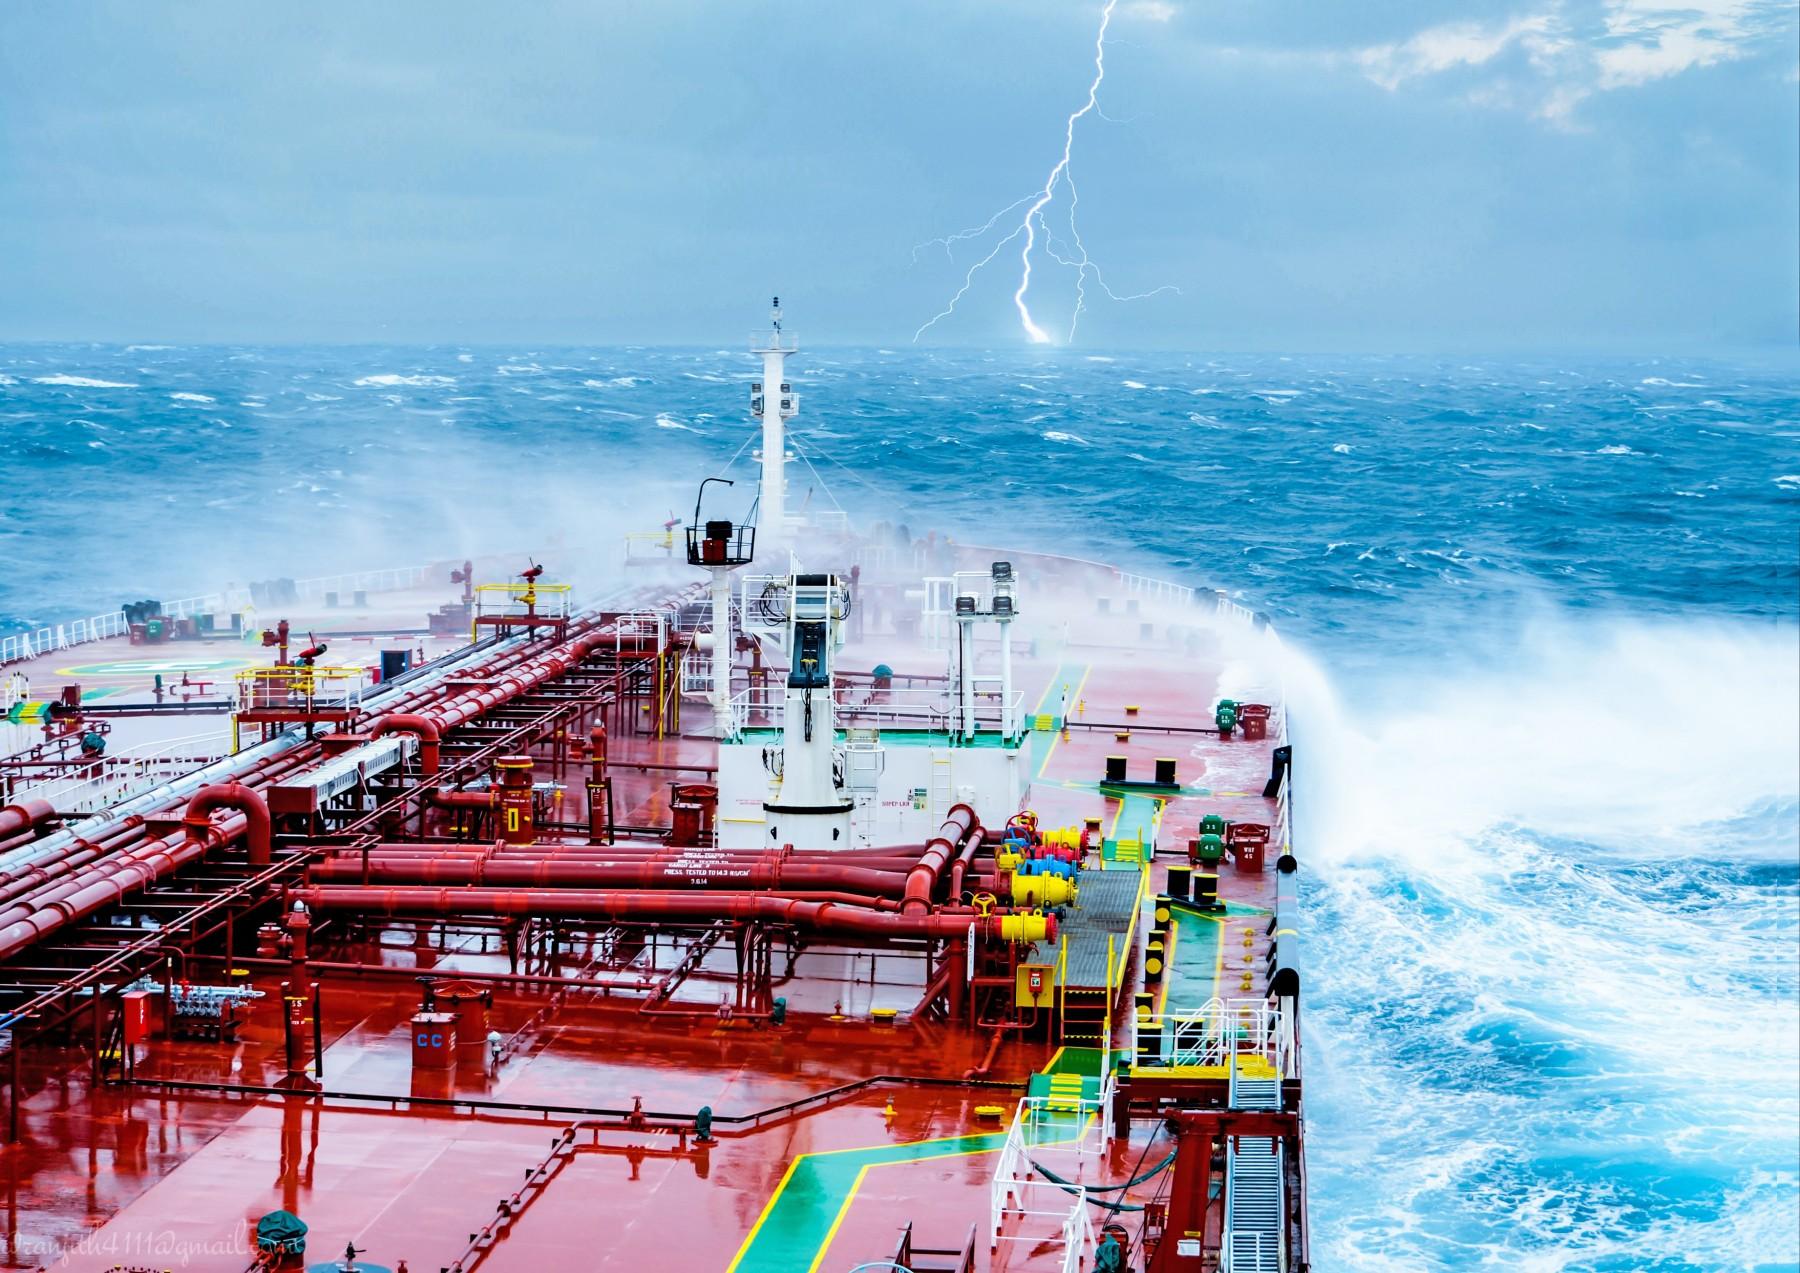 General 1800x1273 ship merchant ship oil tanker storm lightning waves sea vehicle